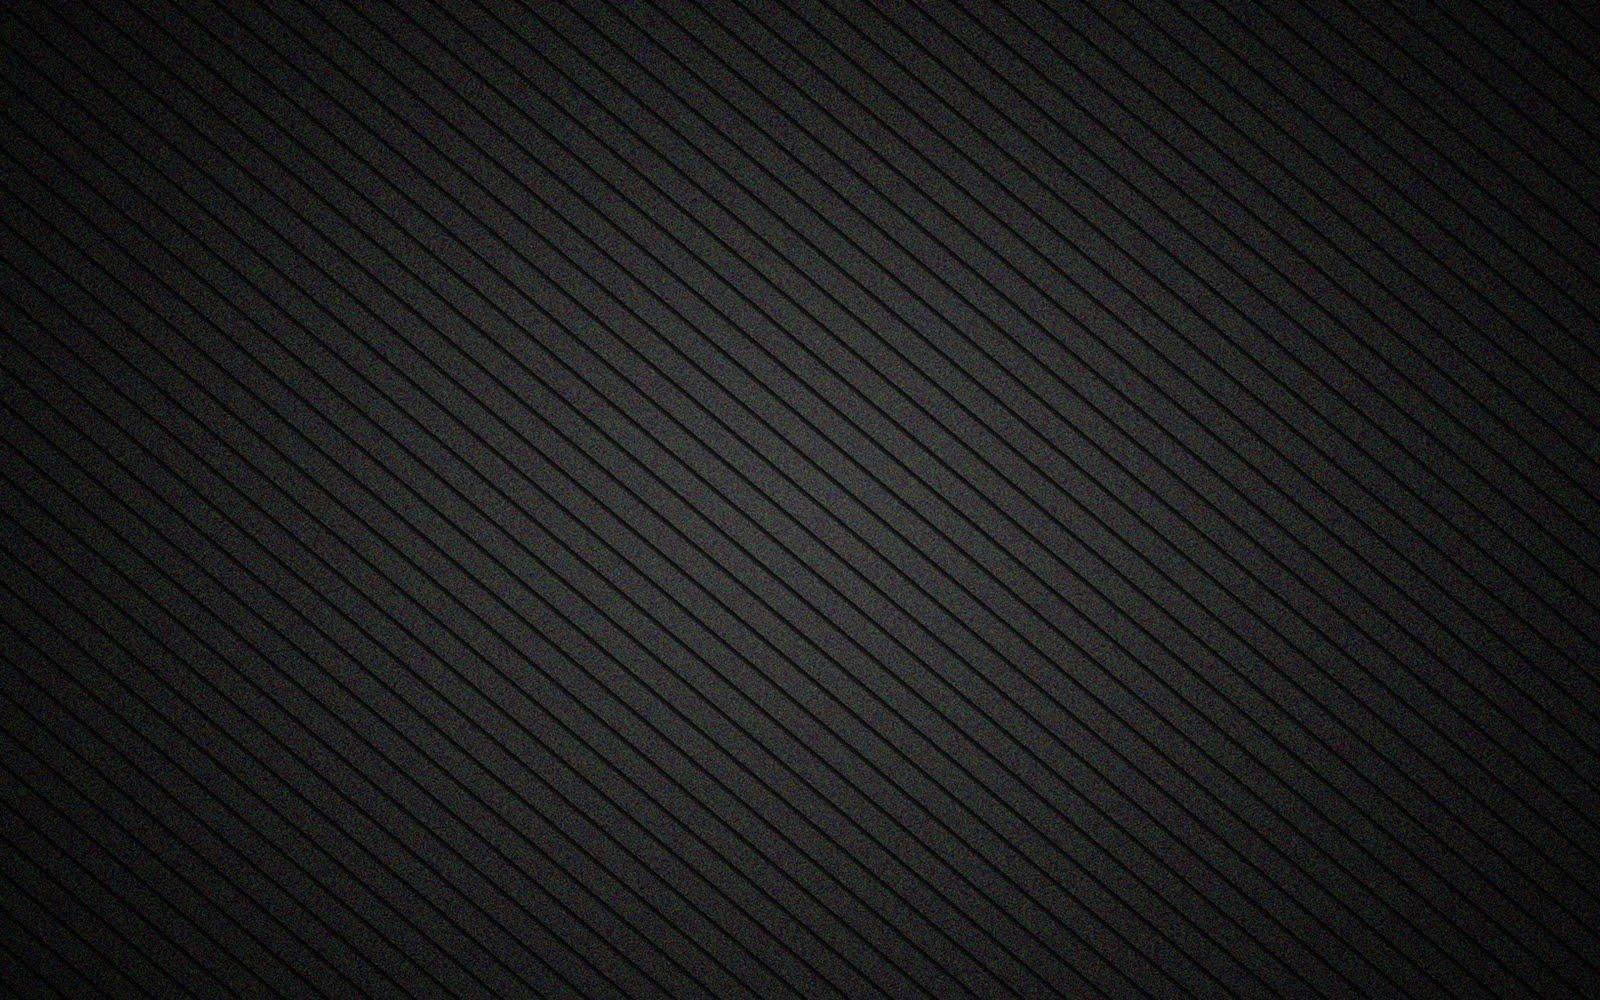 3d black backgrounds wi25 - photo #39